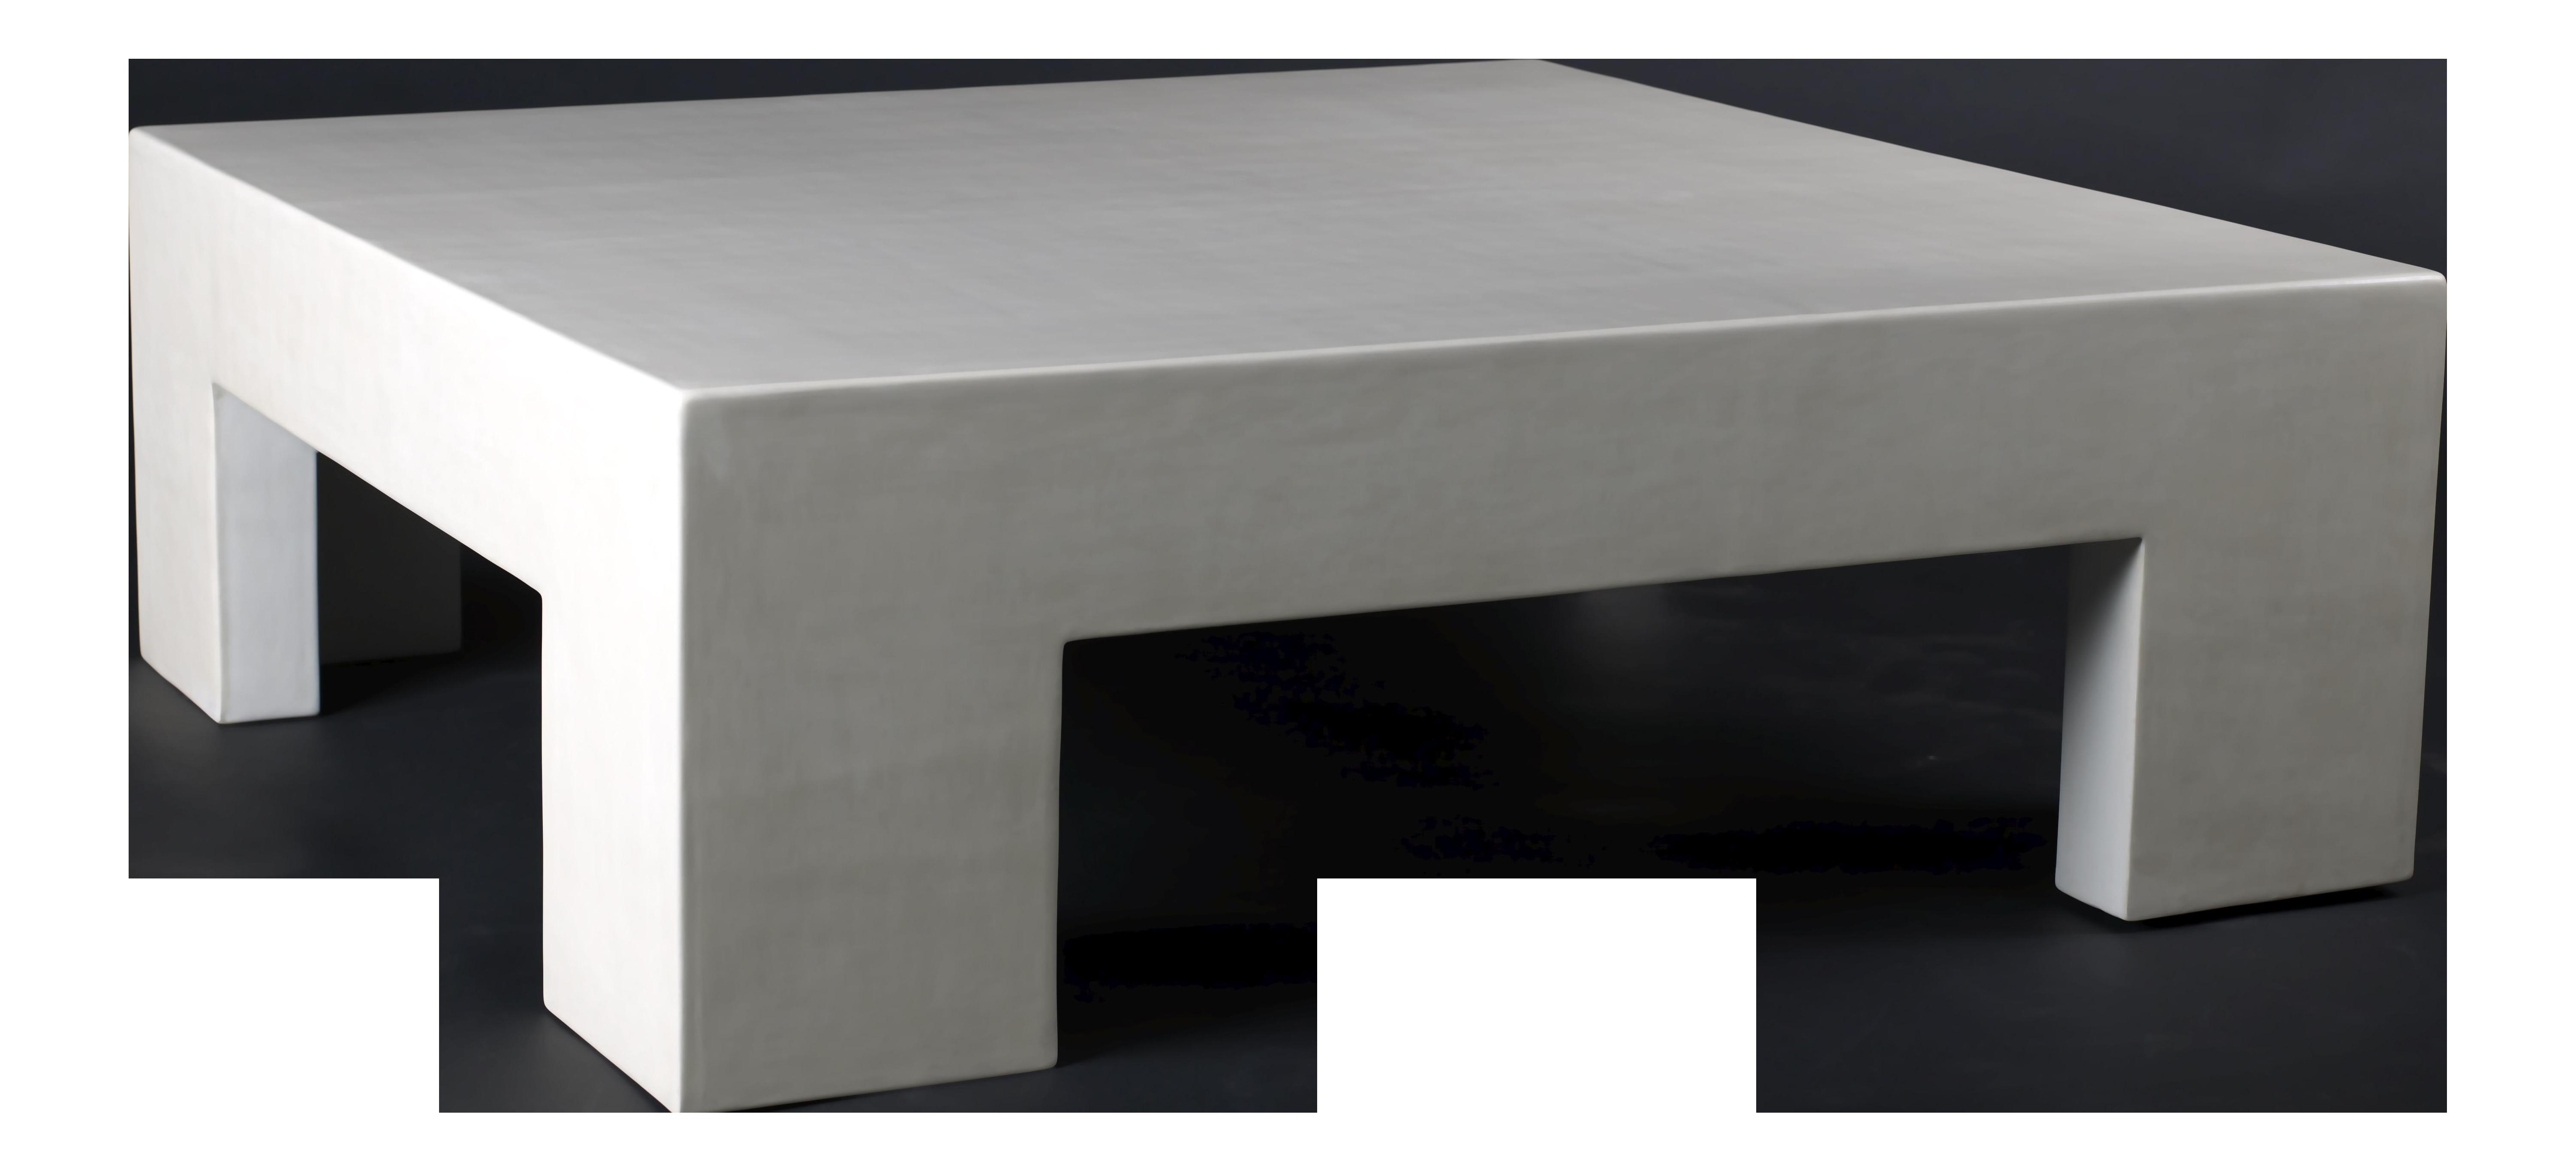 Low Square Table Cream Lacquer On Decaso Com Square Tables